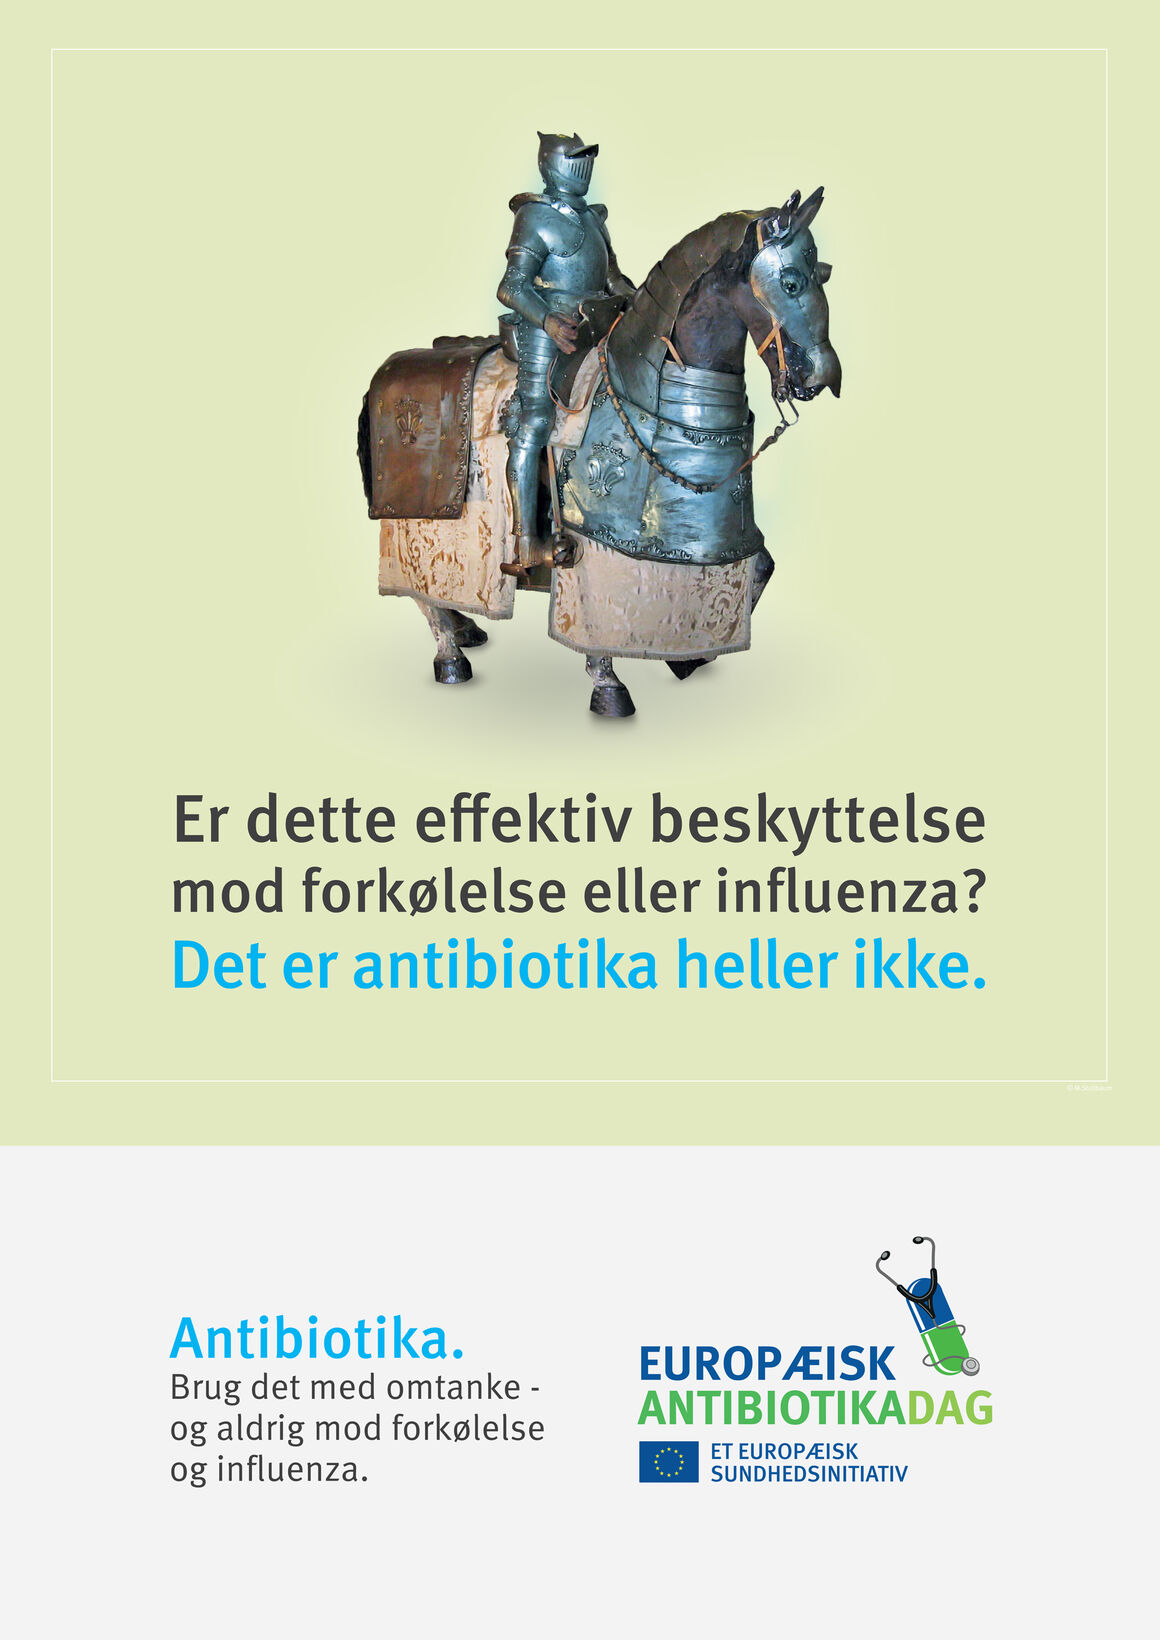 Plakater: Er dette effektiv beskyttelse mod forkølelse eller influenza? Det er antibiotika heller ikke.